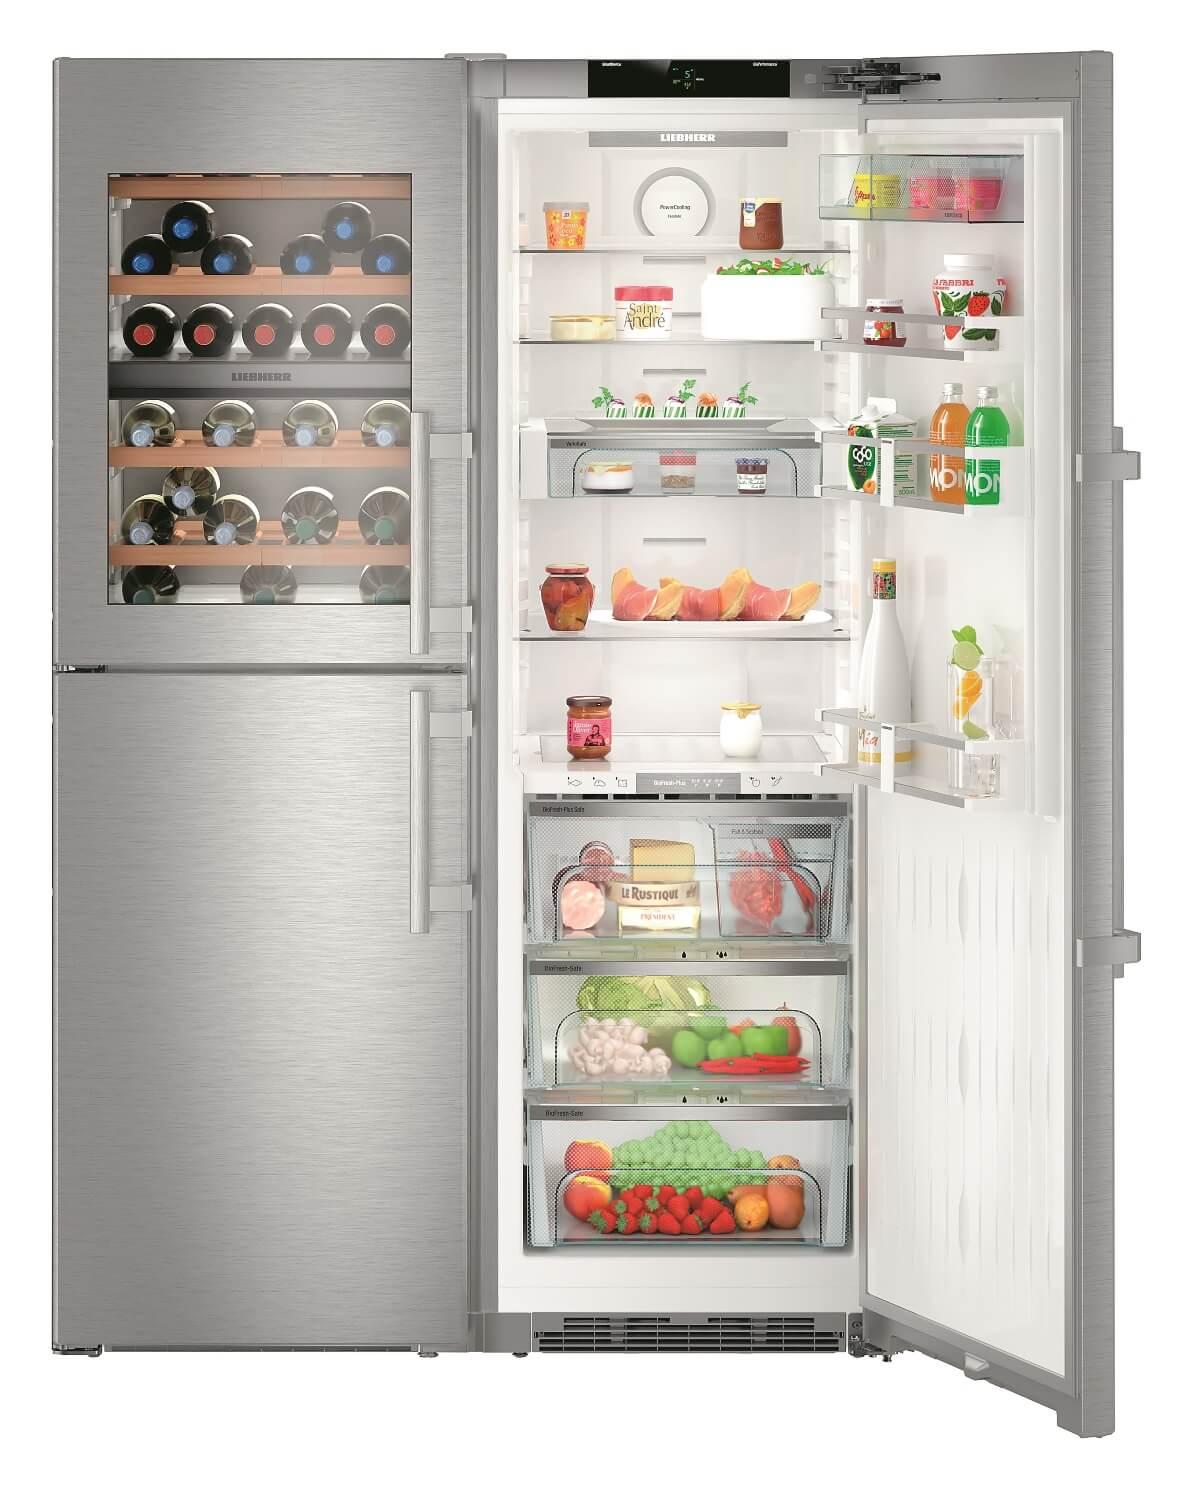 купить Side-by-Side холодильник Liebherr SBSes 8486 Украина фото 6